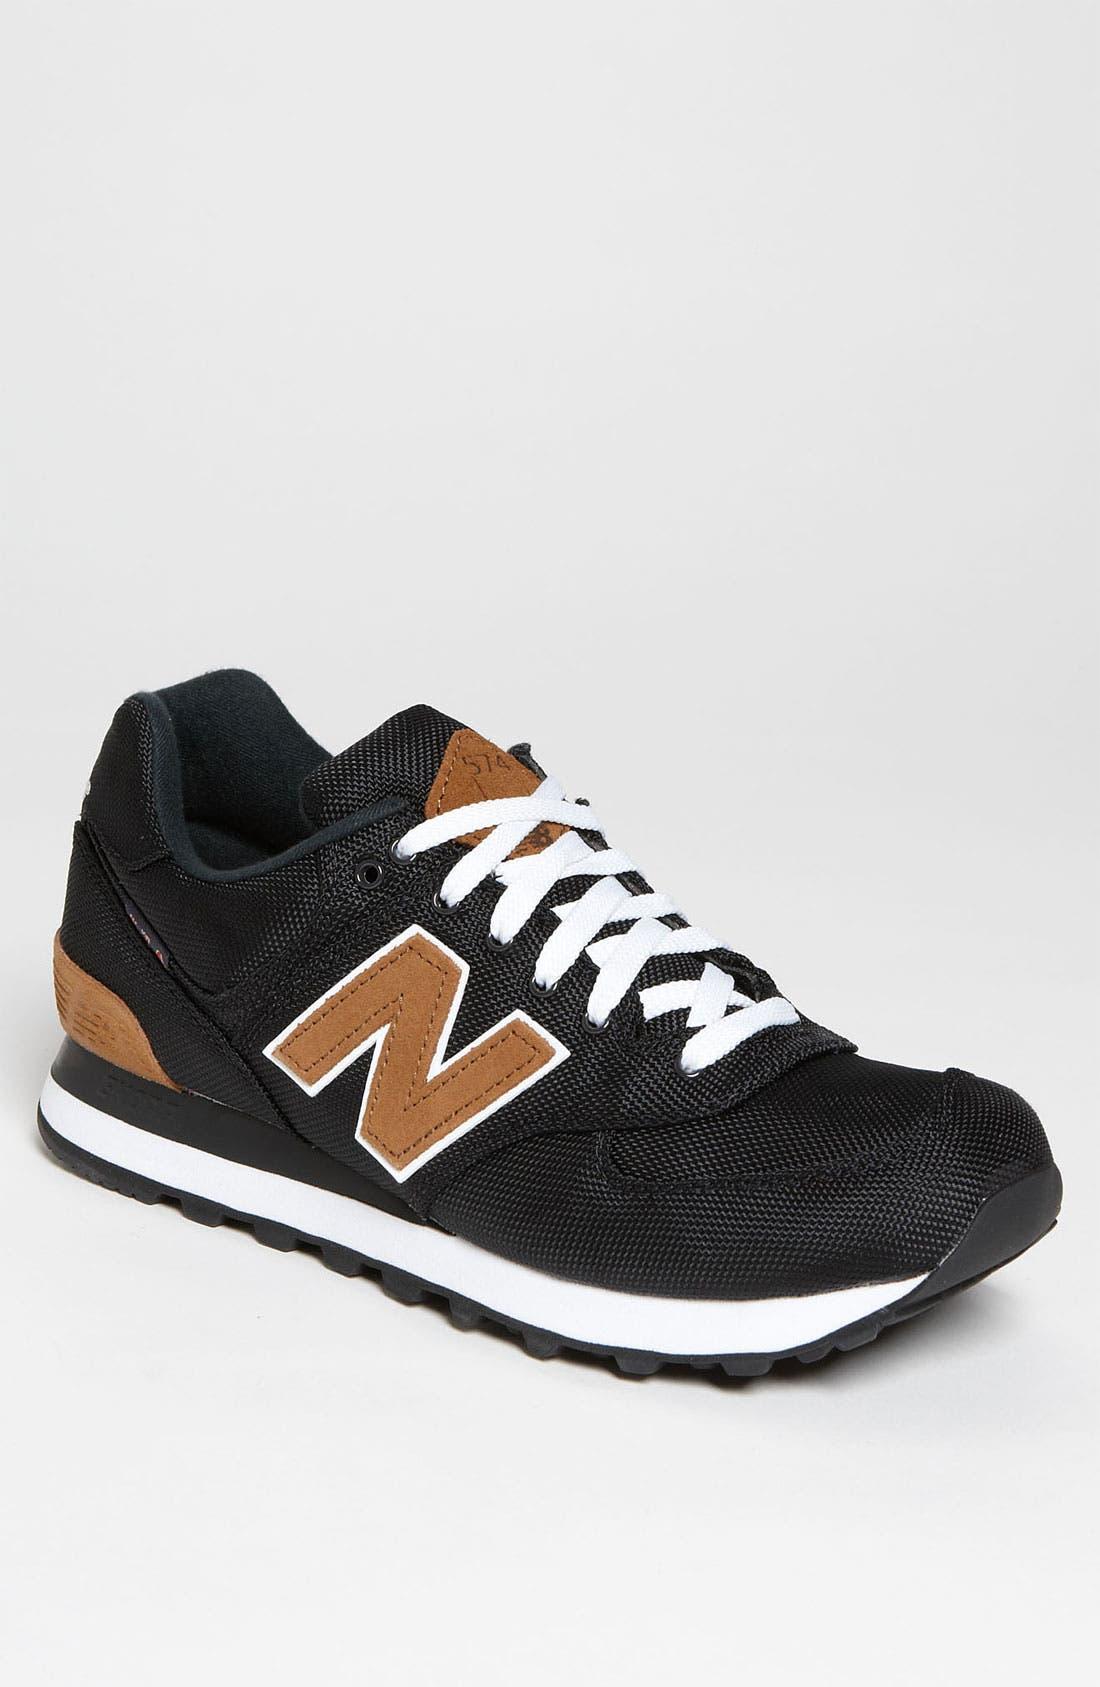 Alternate Image 1 Selected - New Balance '574 Backpack' Sneaker (Men)